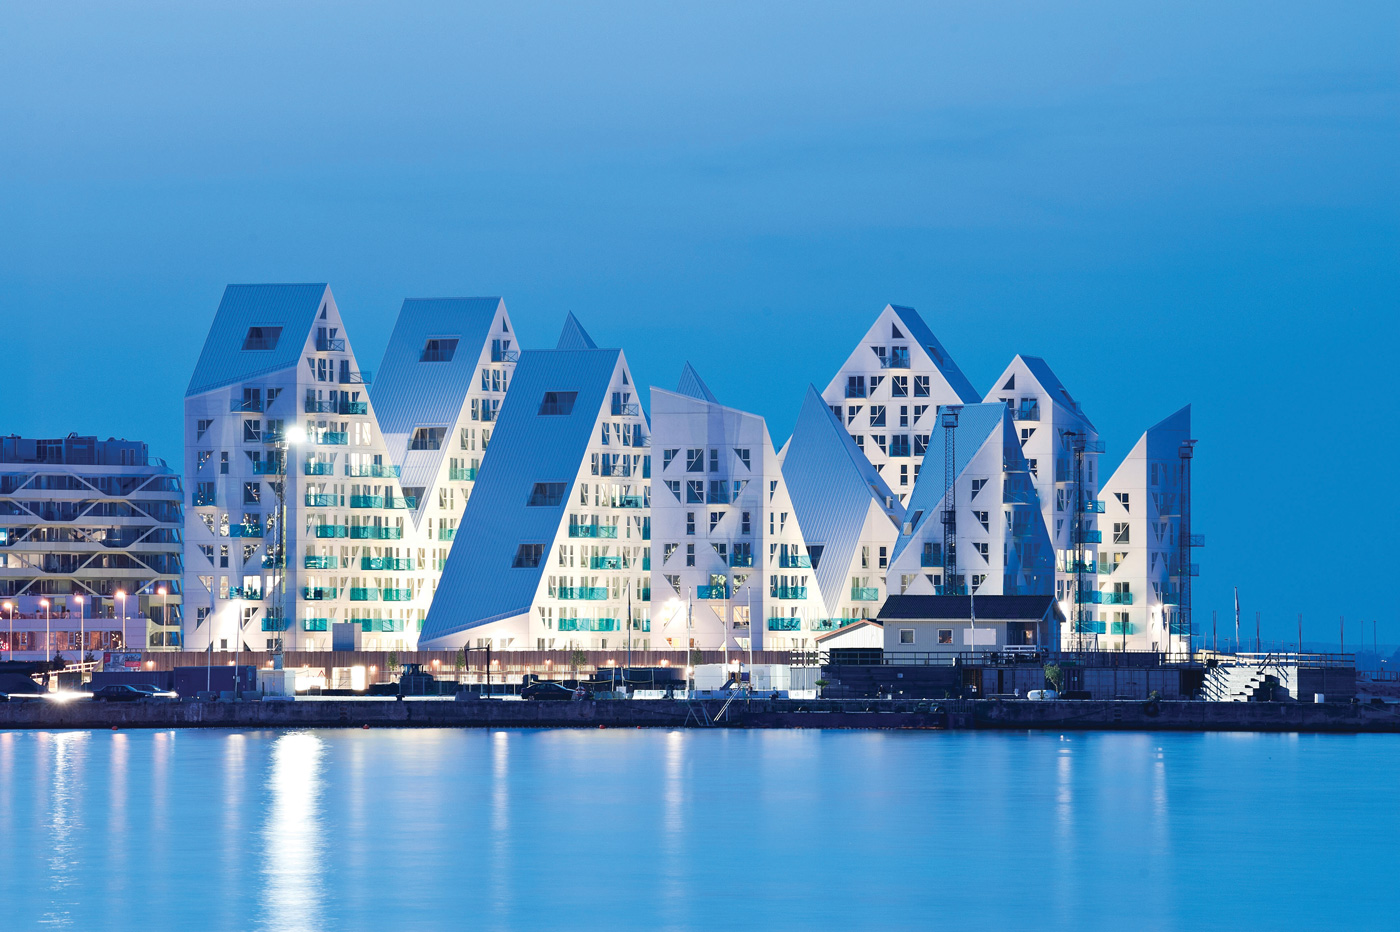 The Iceberg apartment complex in Aarhus, Denmark